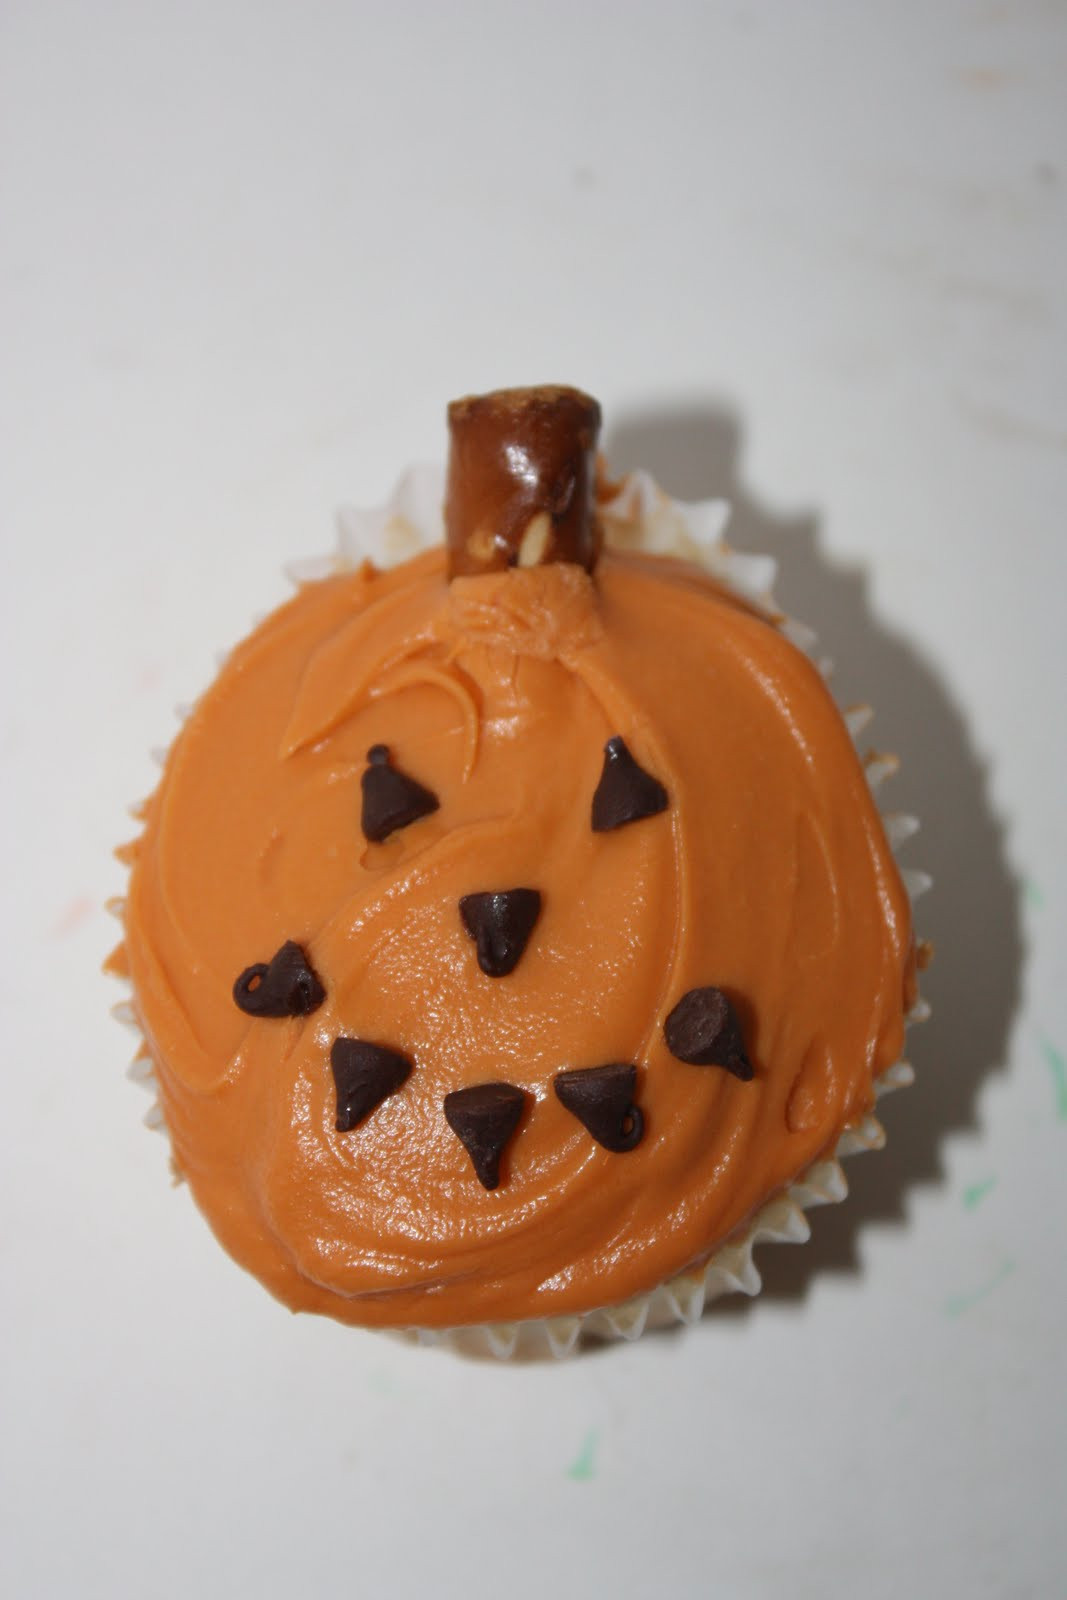 Halloween Pumpkin Cupcakes  My Food Looks Like a Pumpkin Happy Home Fairy